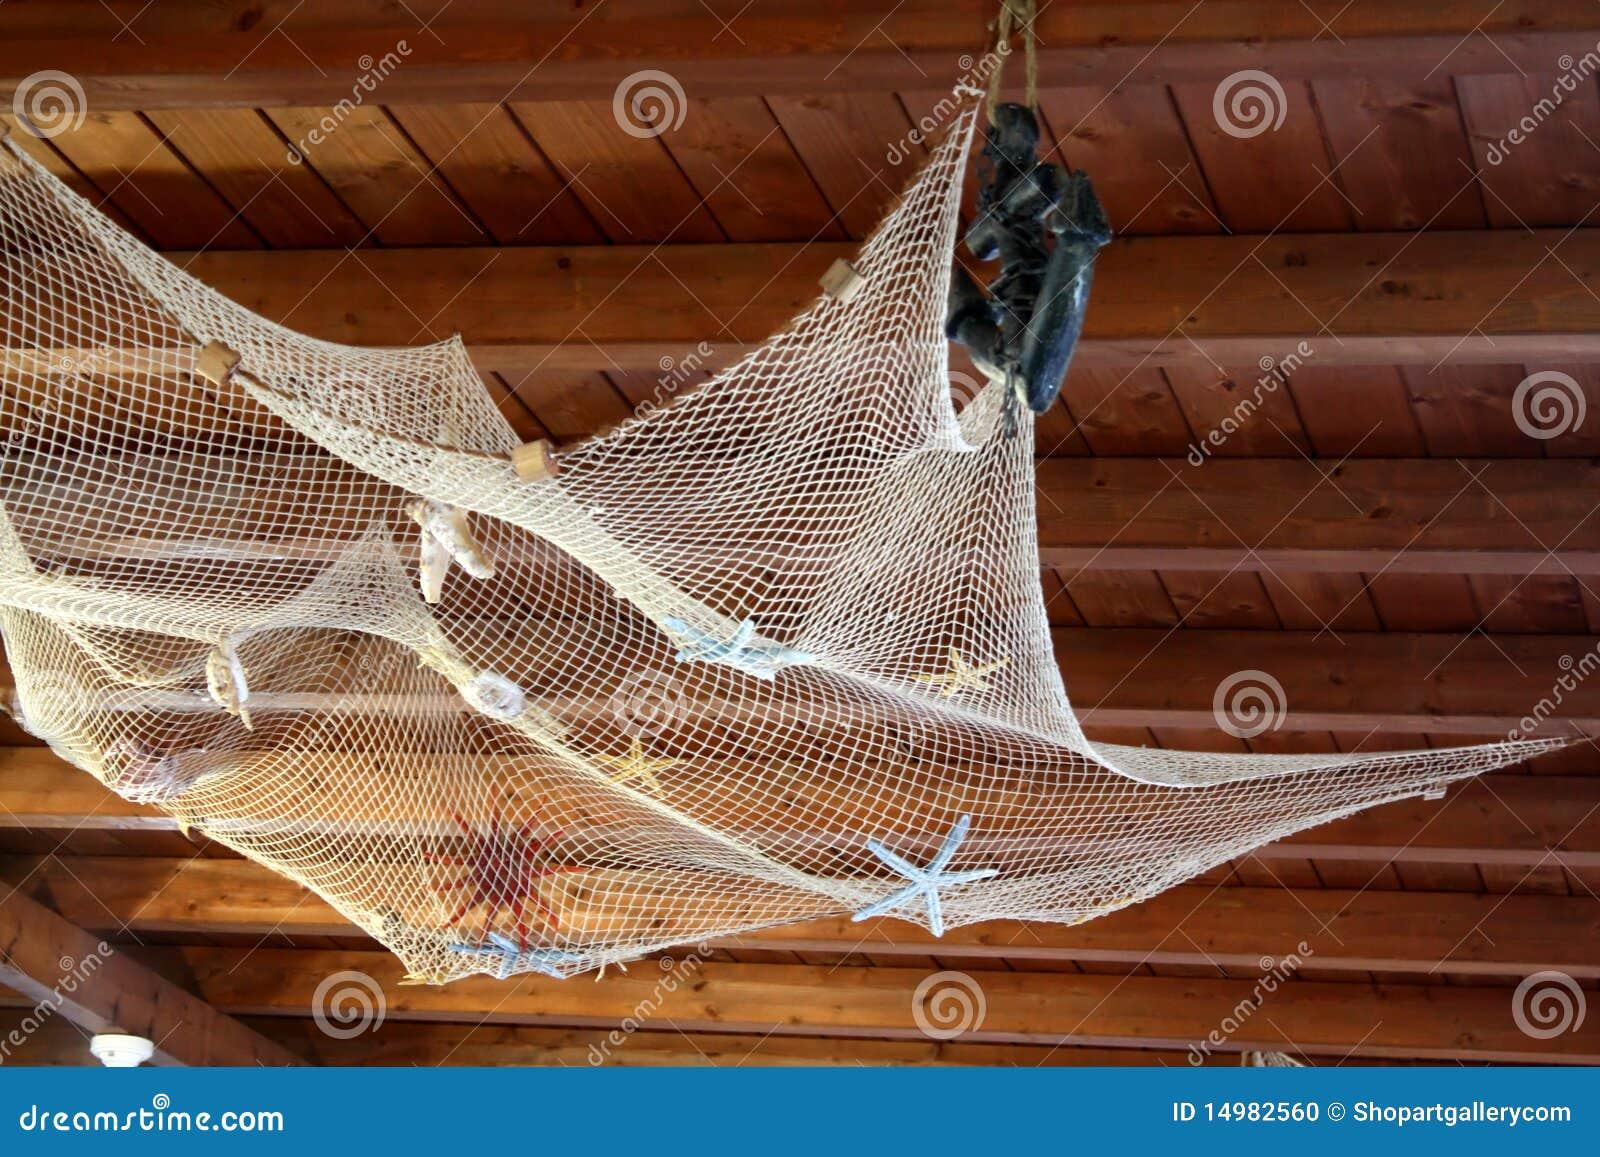 Fishing net on wood ceiling stock photo image of for Fishing net decor ideas